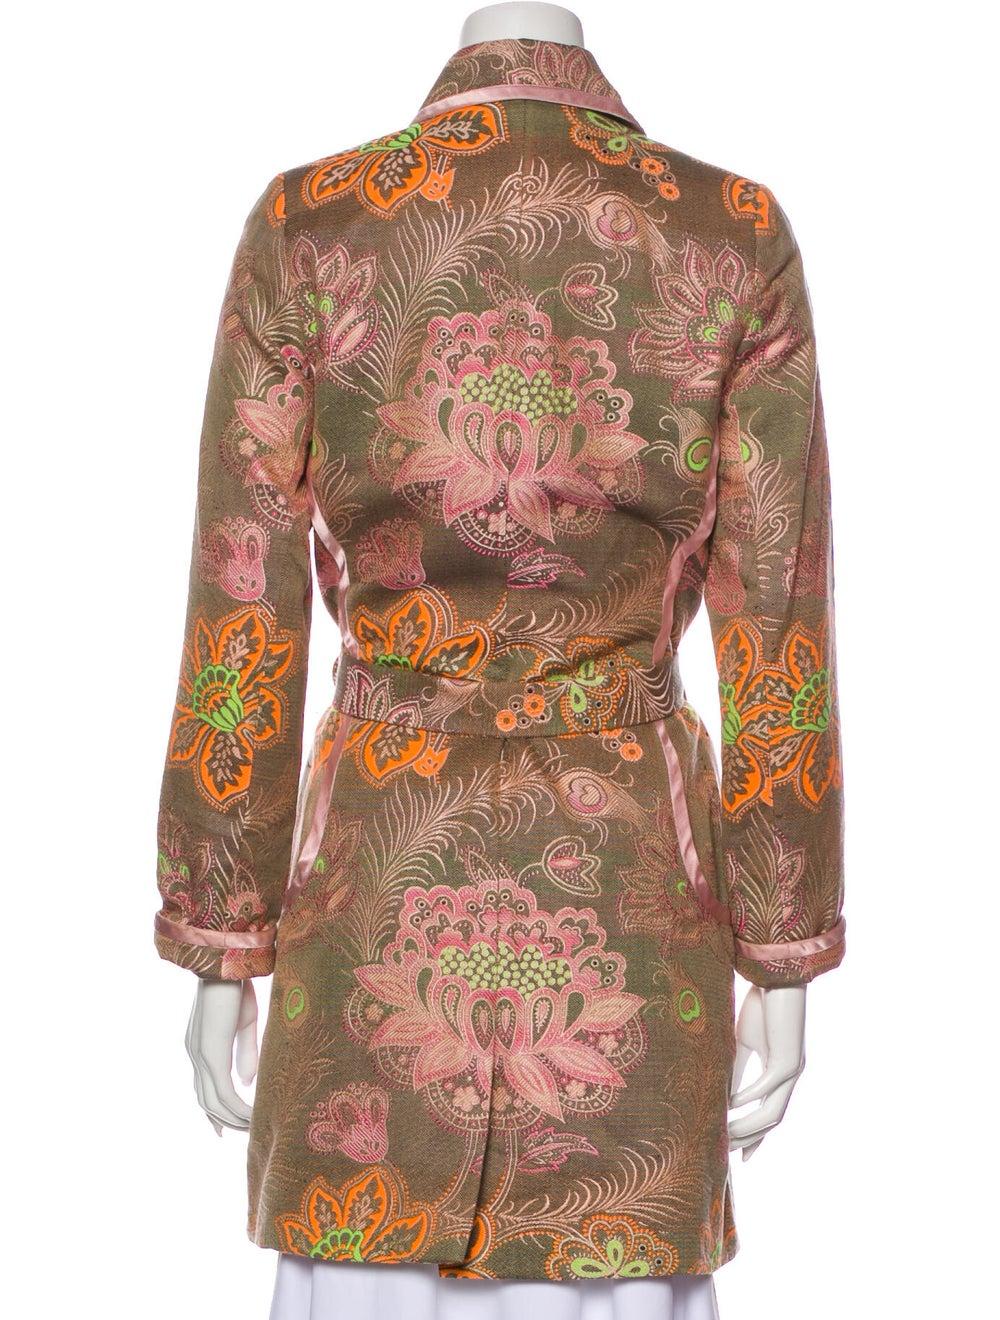 Matthew Williamson Floral Print Trench Coat Pink - image 3